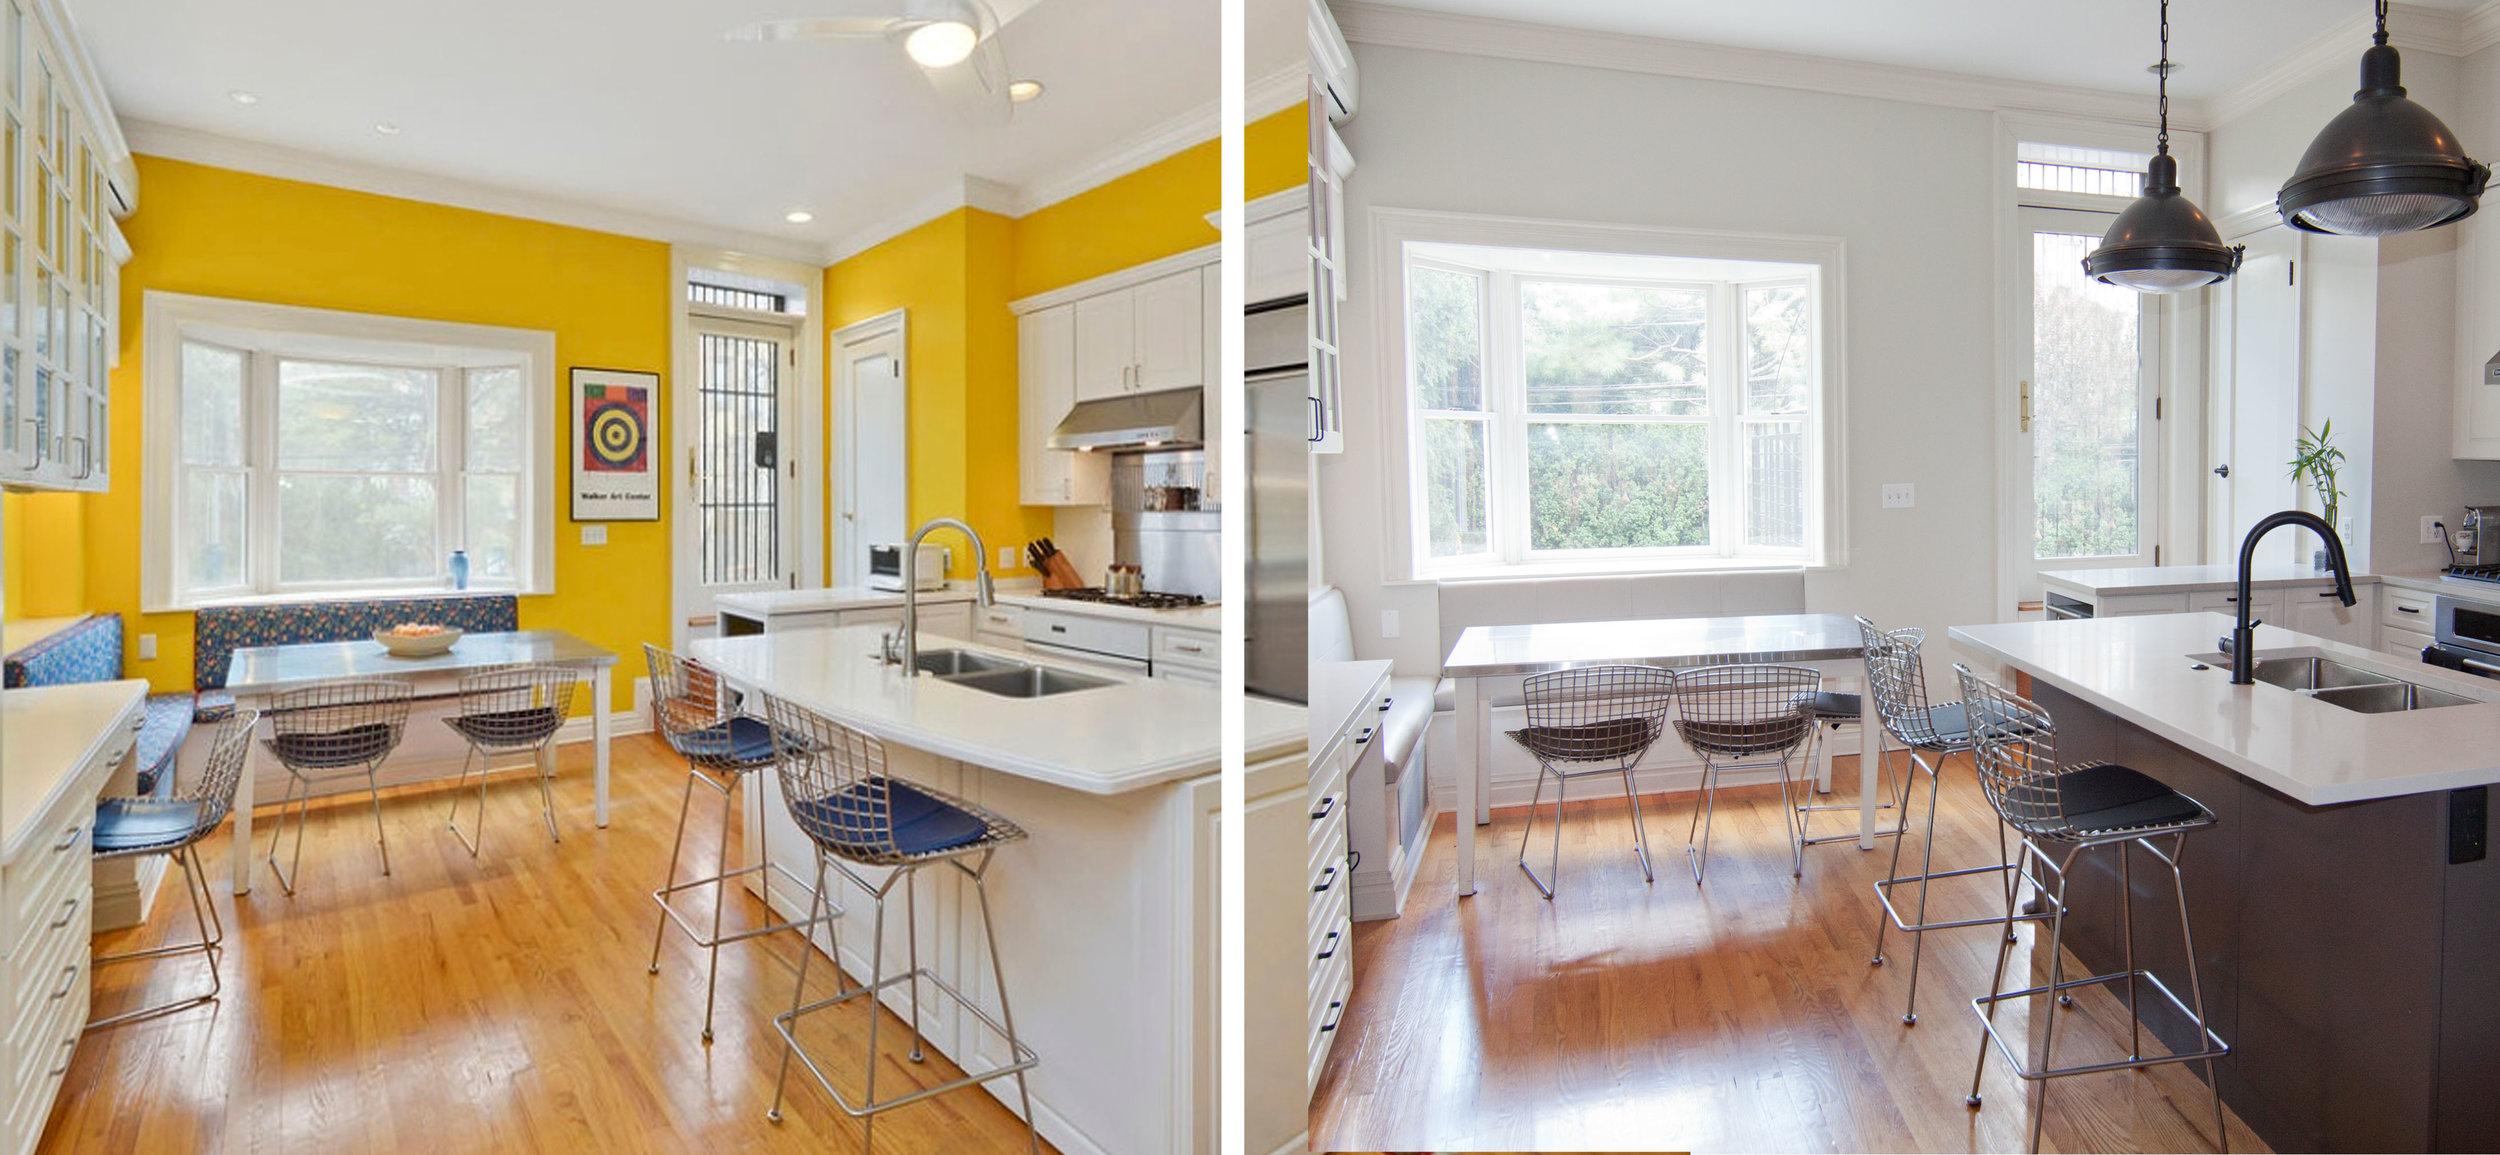 kitchen_before_after.jpg